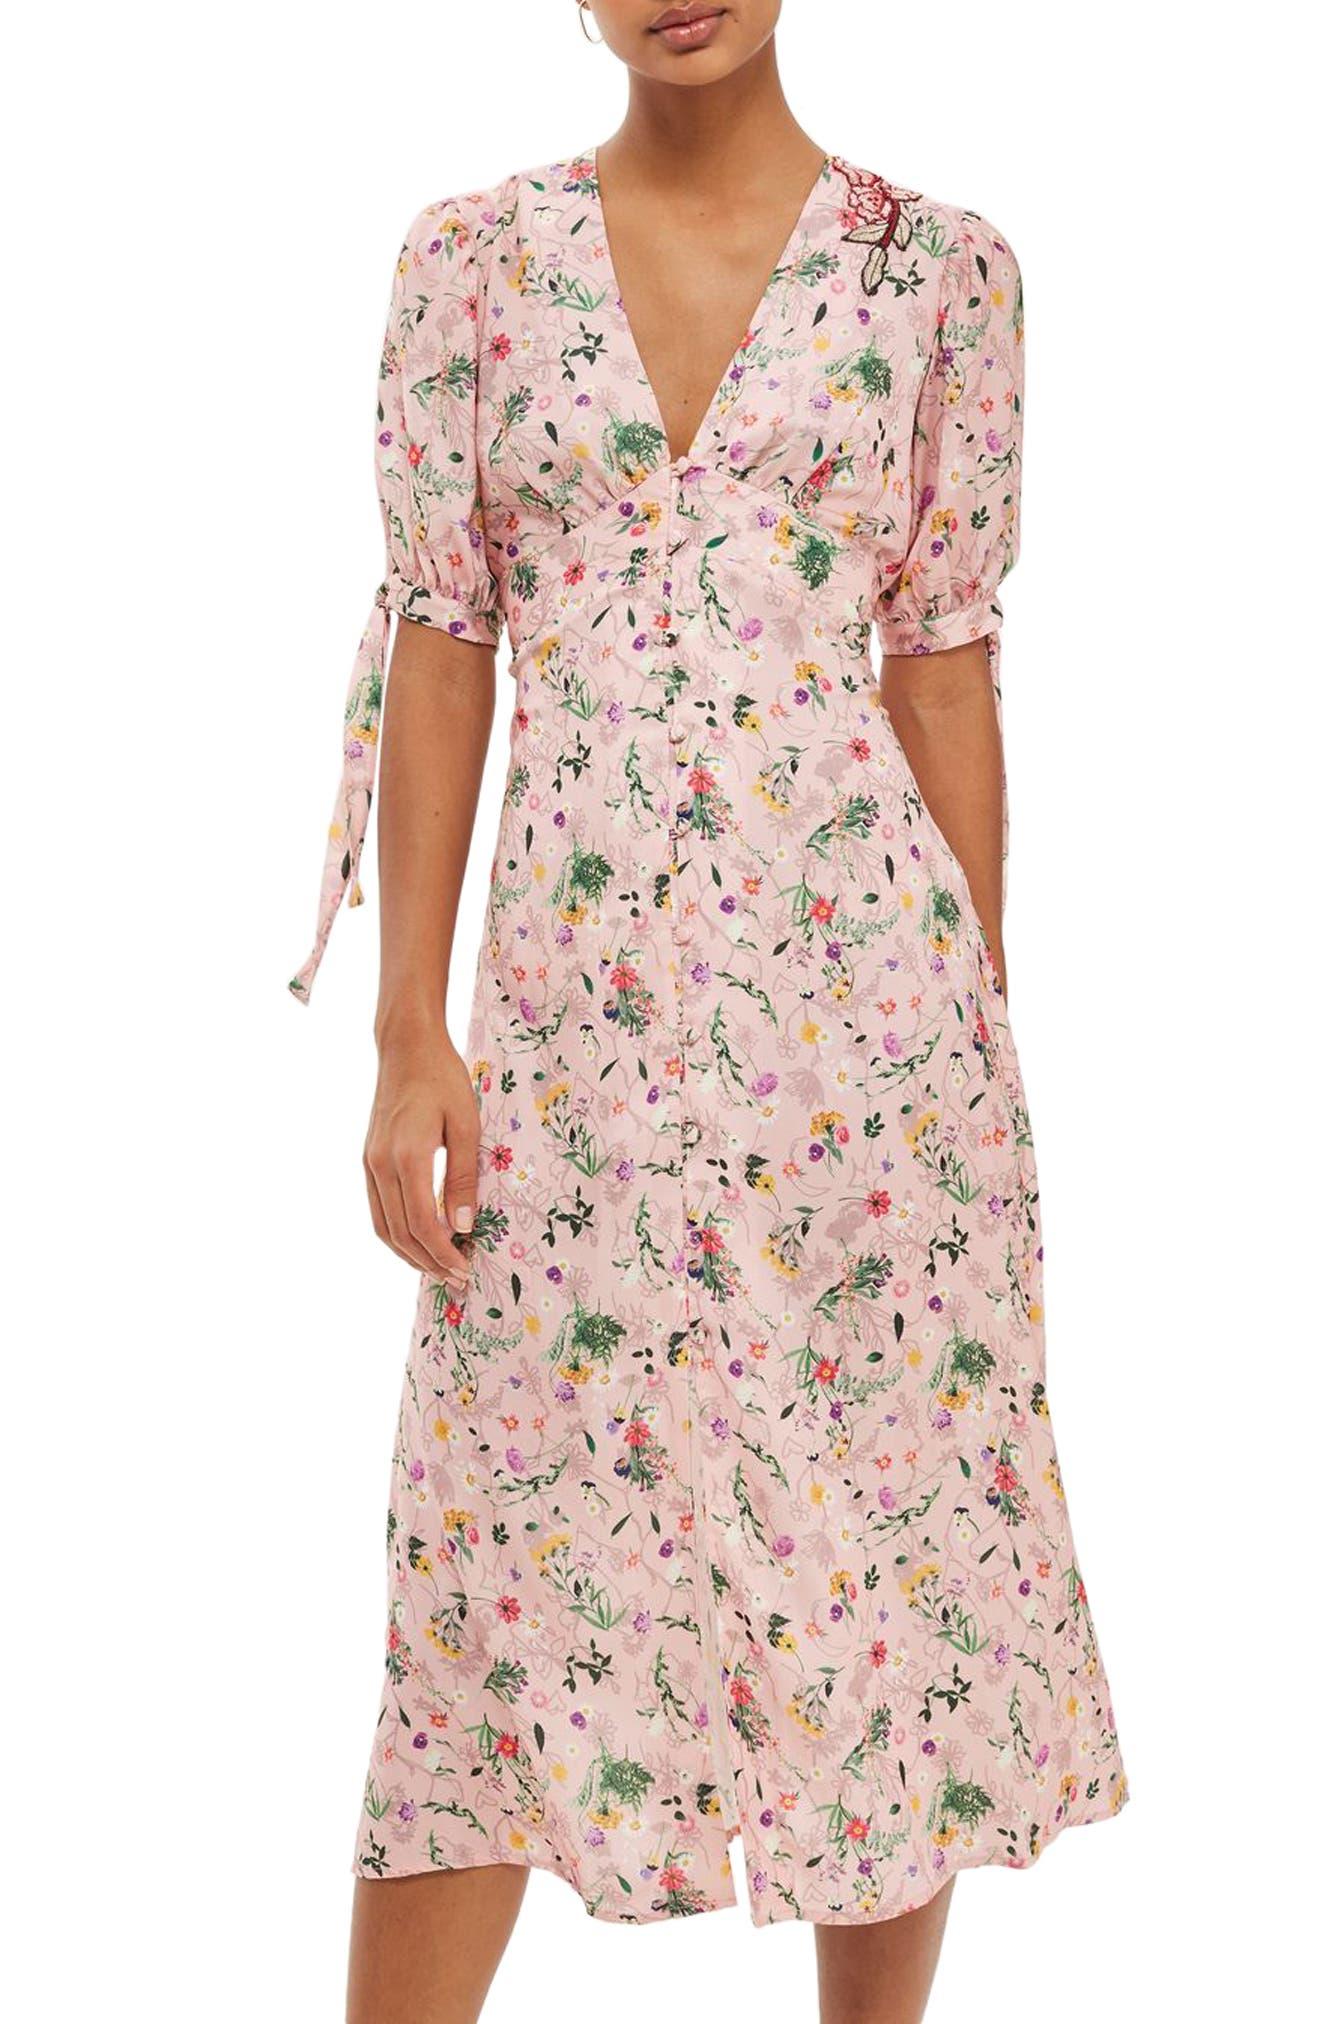 Topshop Floral Appliqué Print Midi Dress